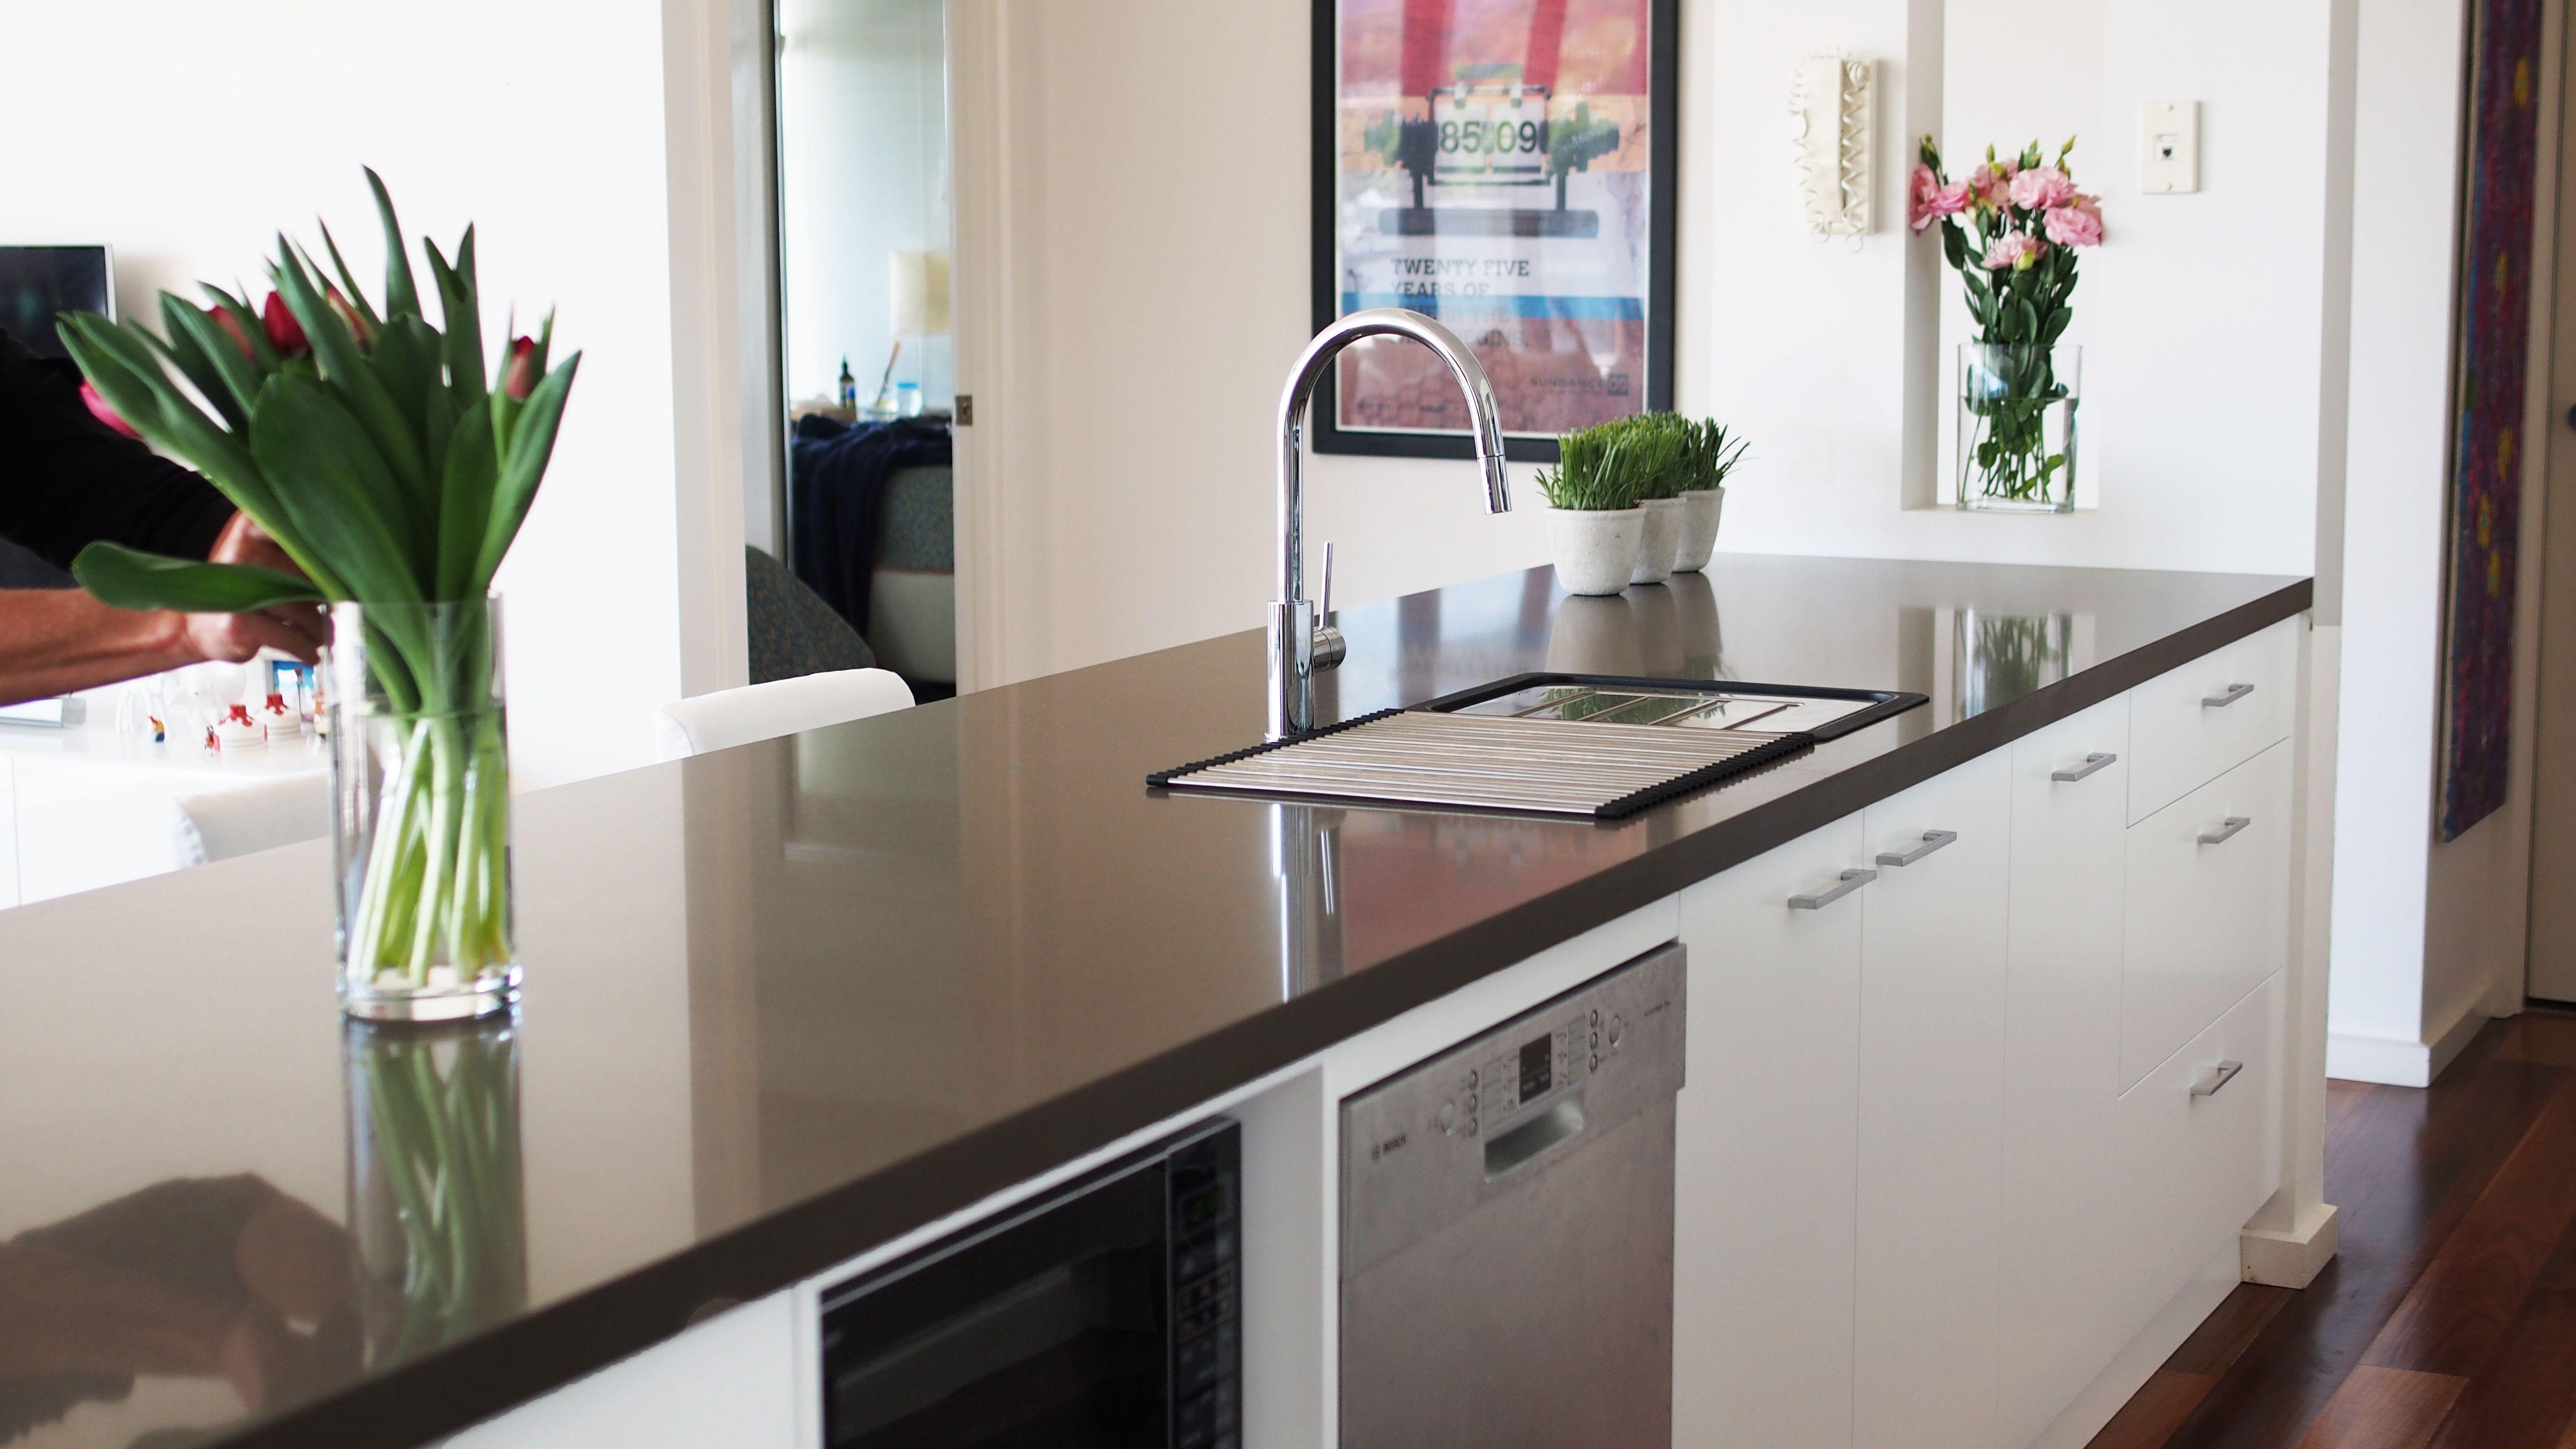 Penthouse Kitchen Project Toowong, Brisbane Made to